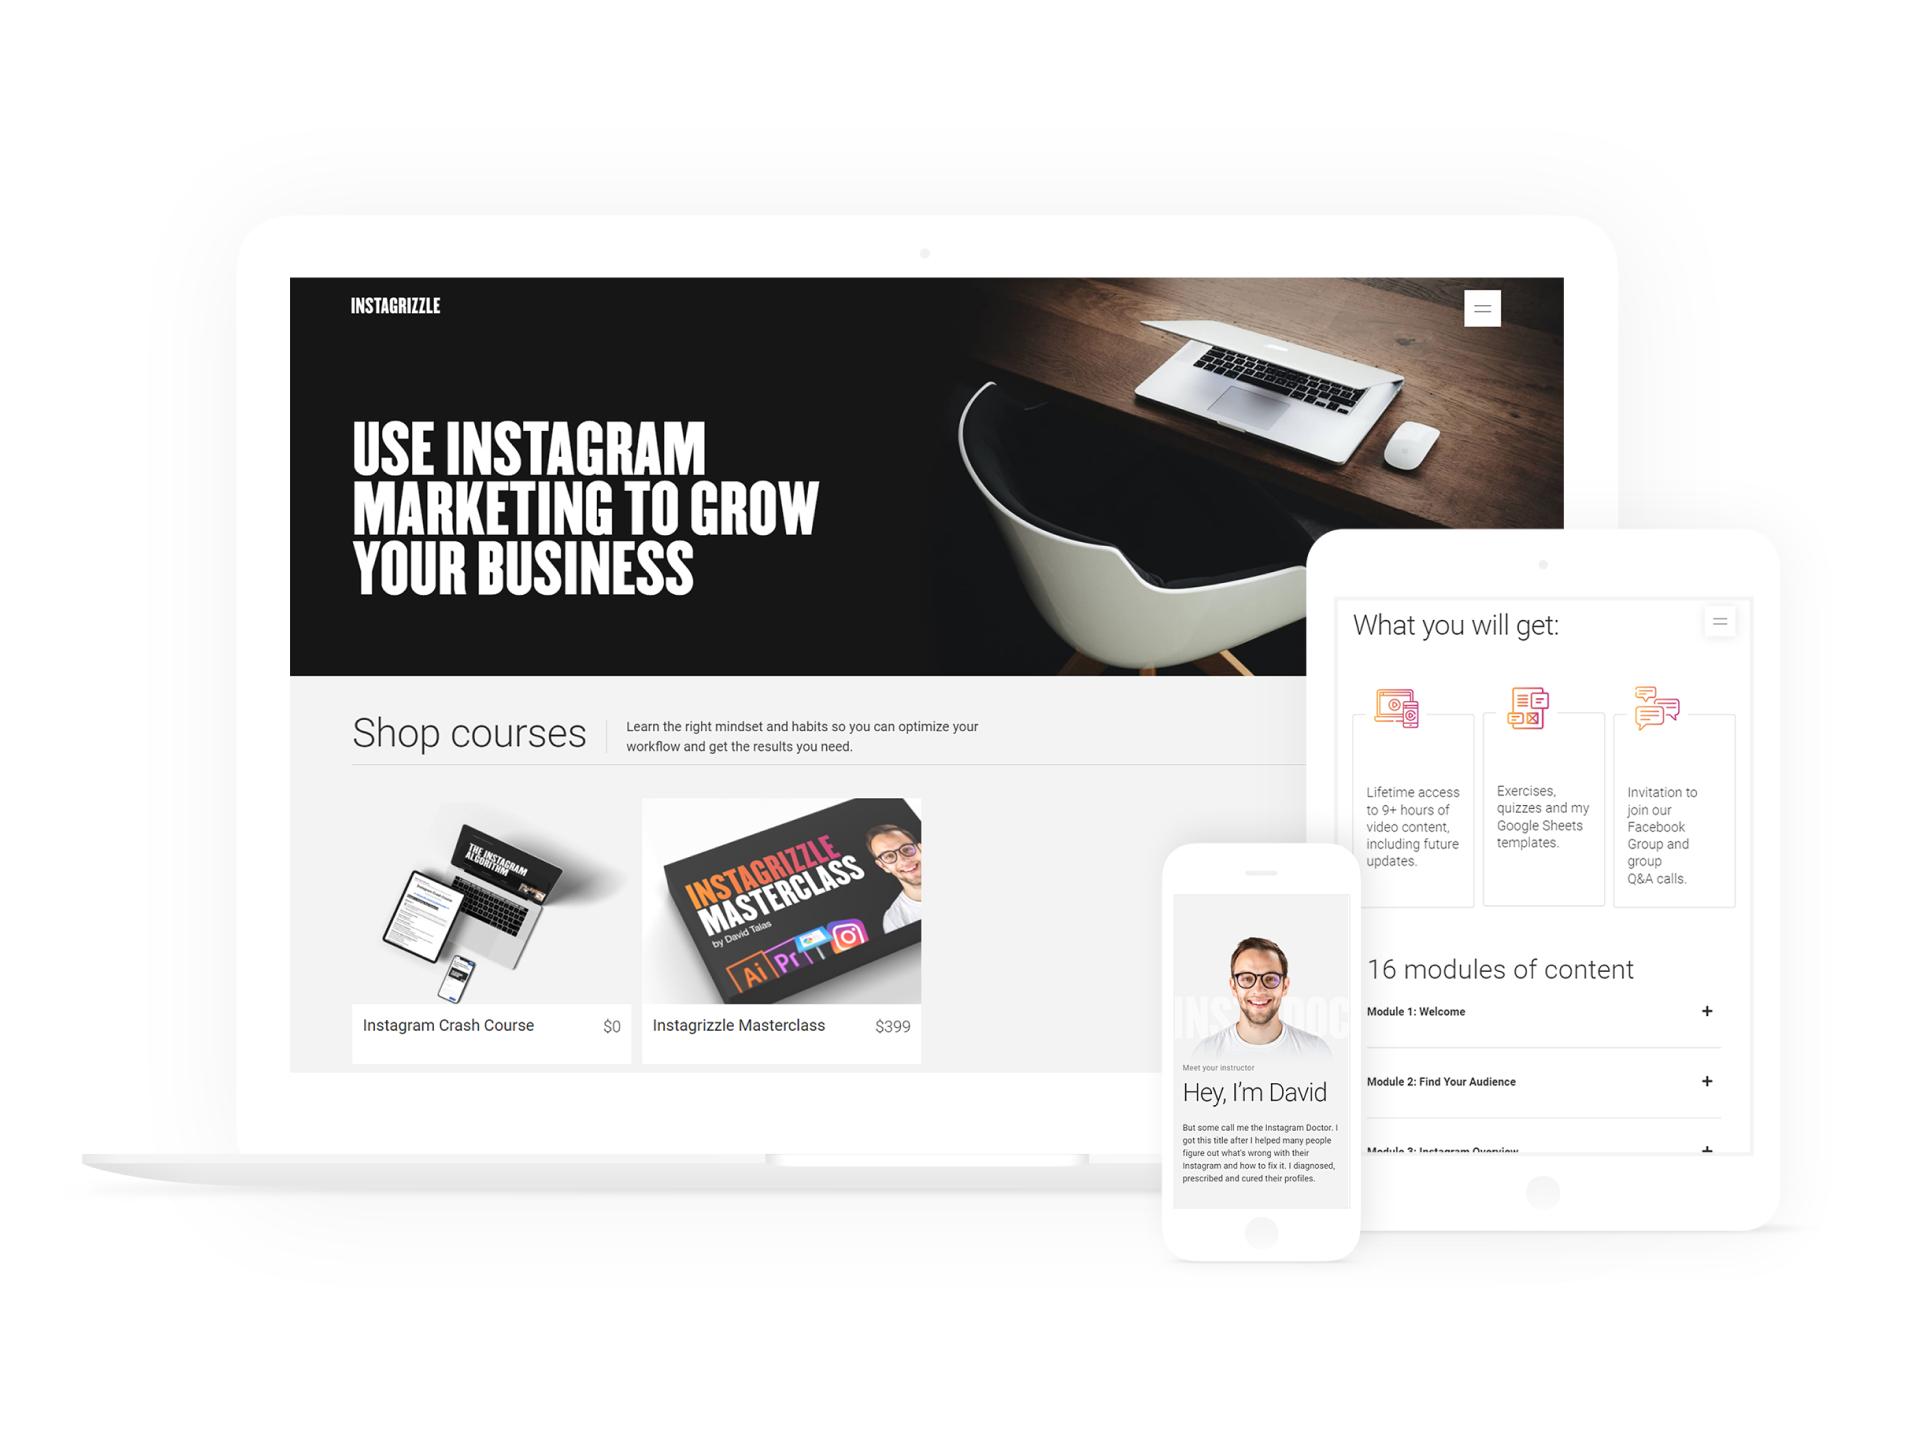 david's website inside white macbook, ipad and iphone